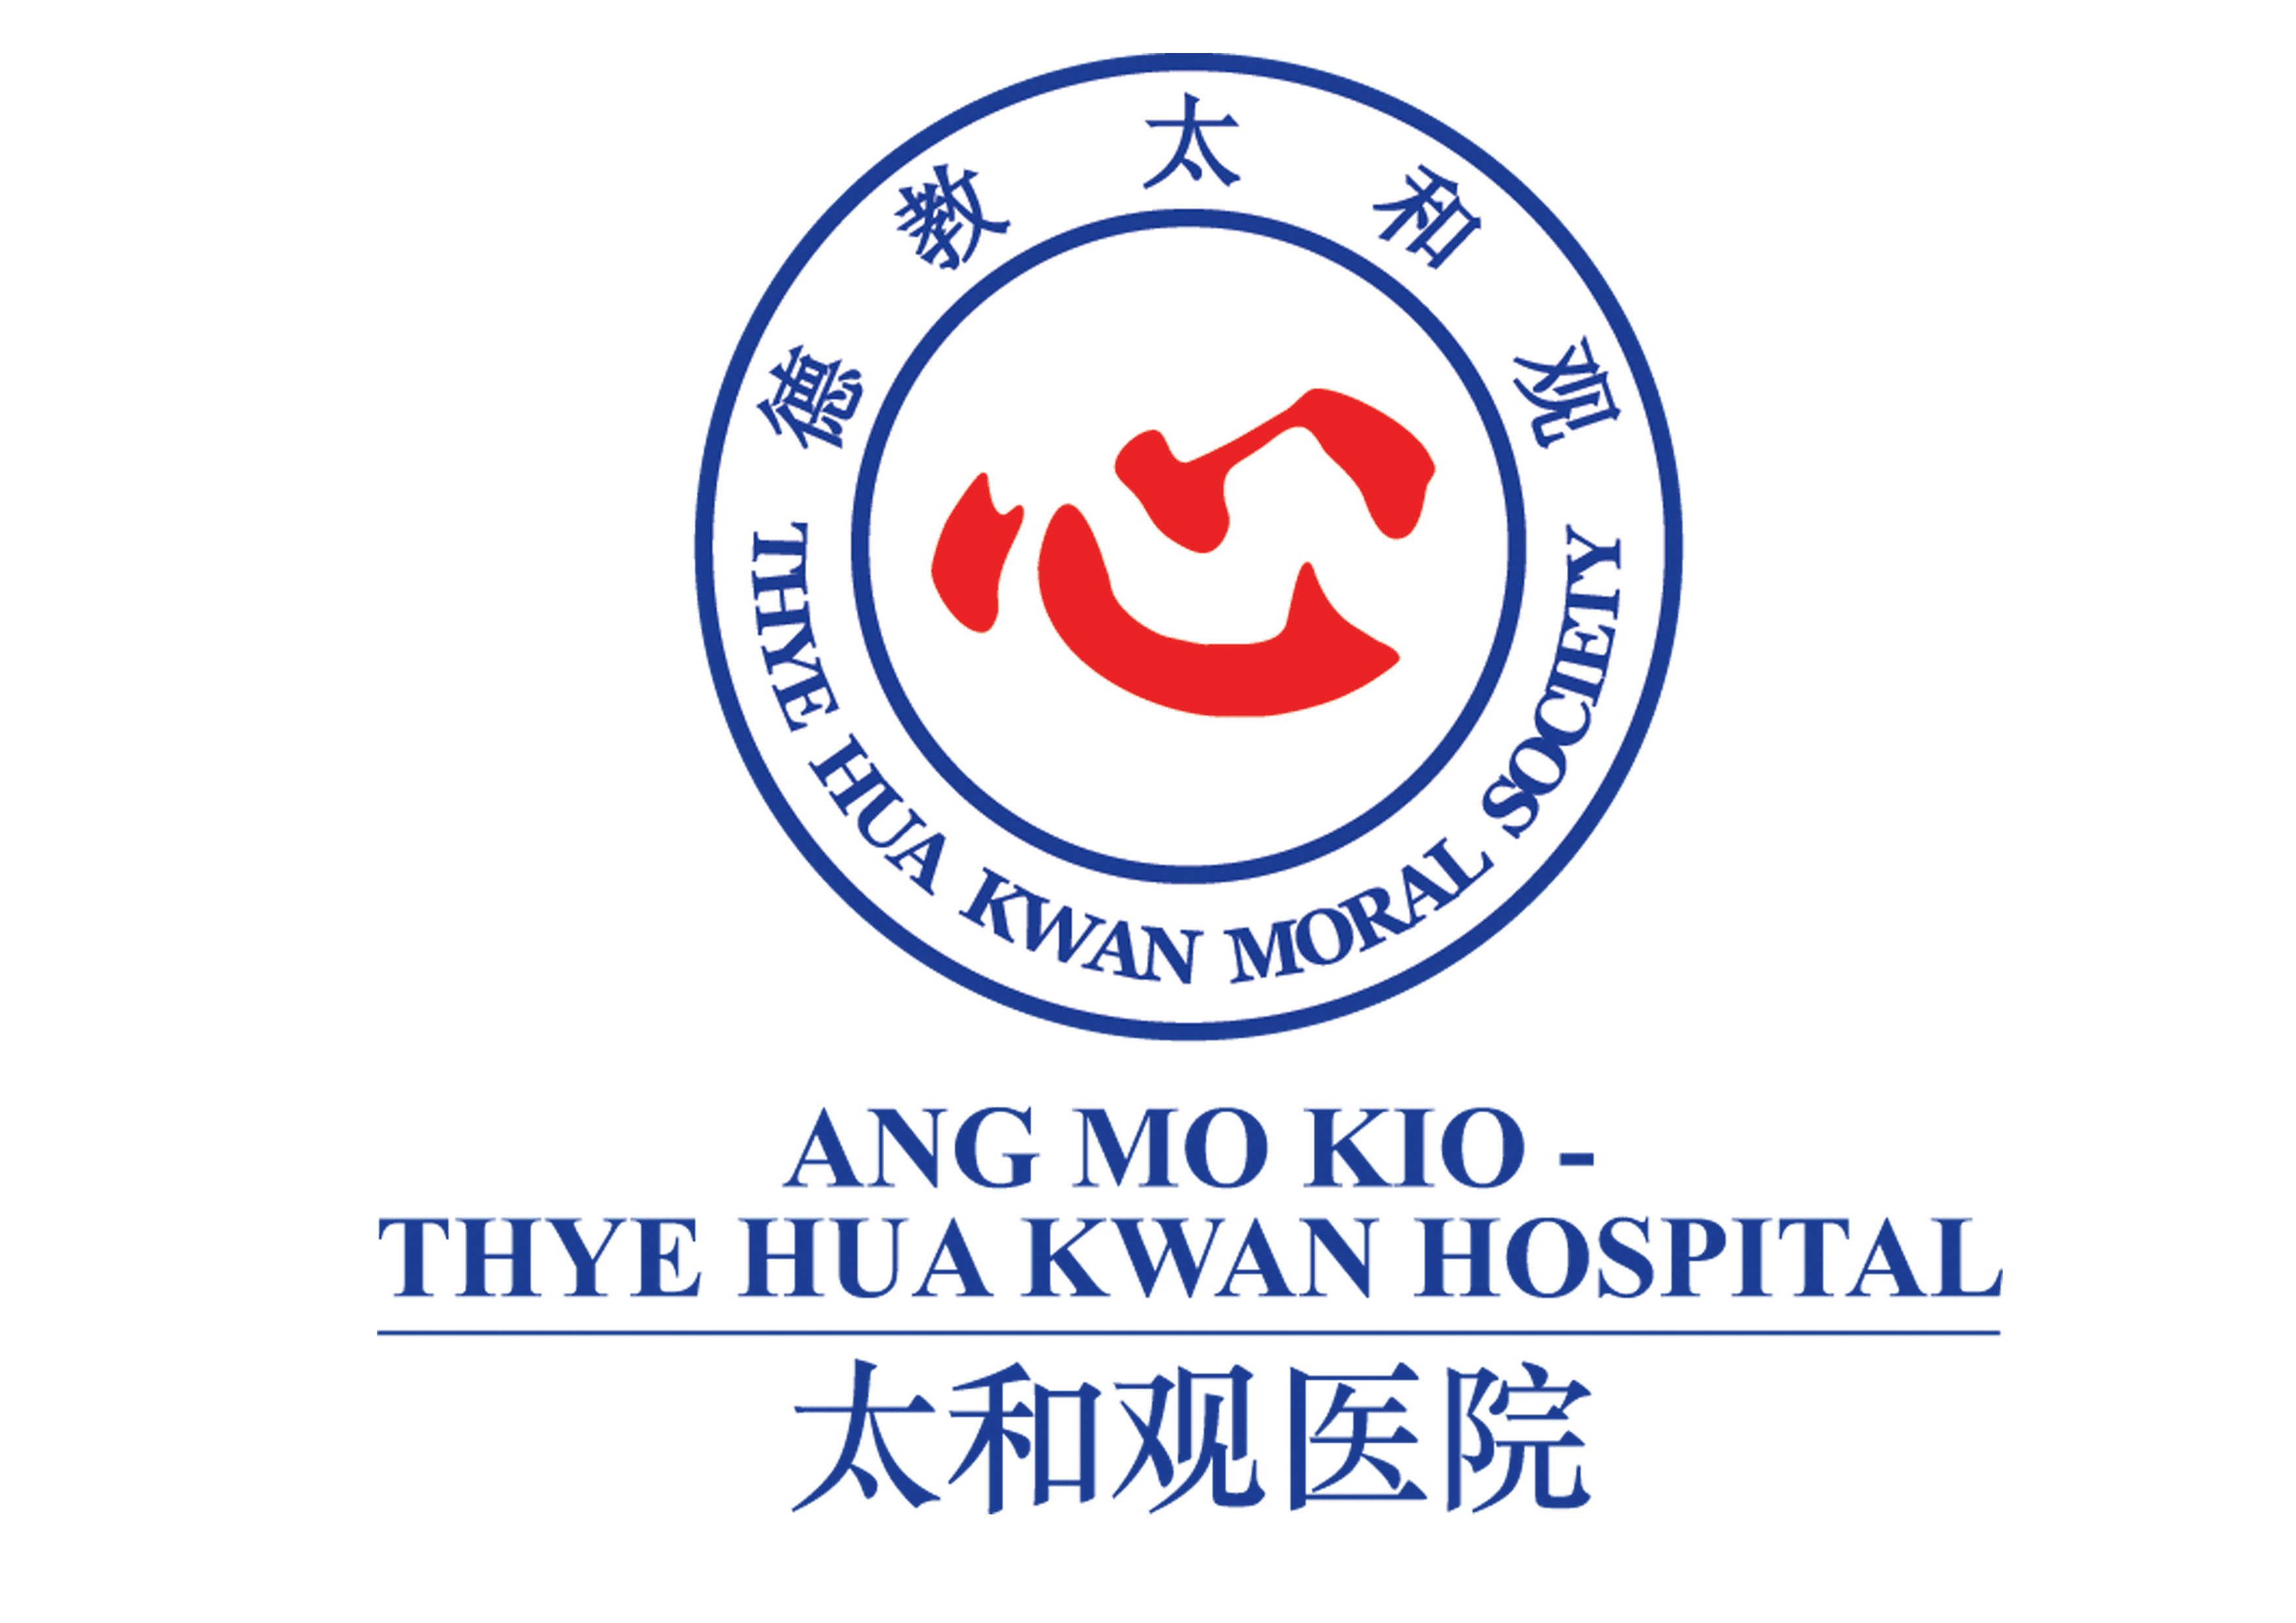 Ang_Mo_Kio_-_Thye_Hua_Kwan_Hospital_Logo